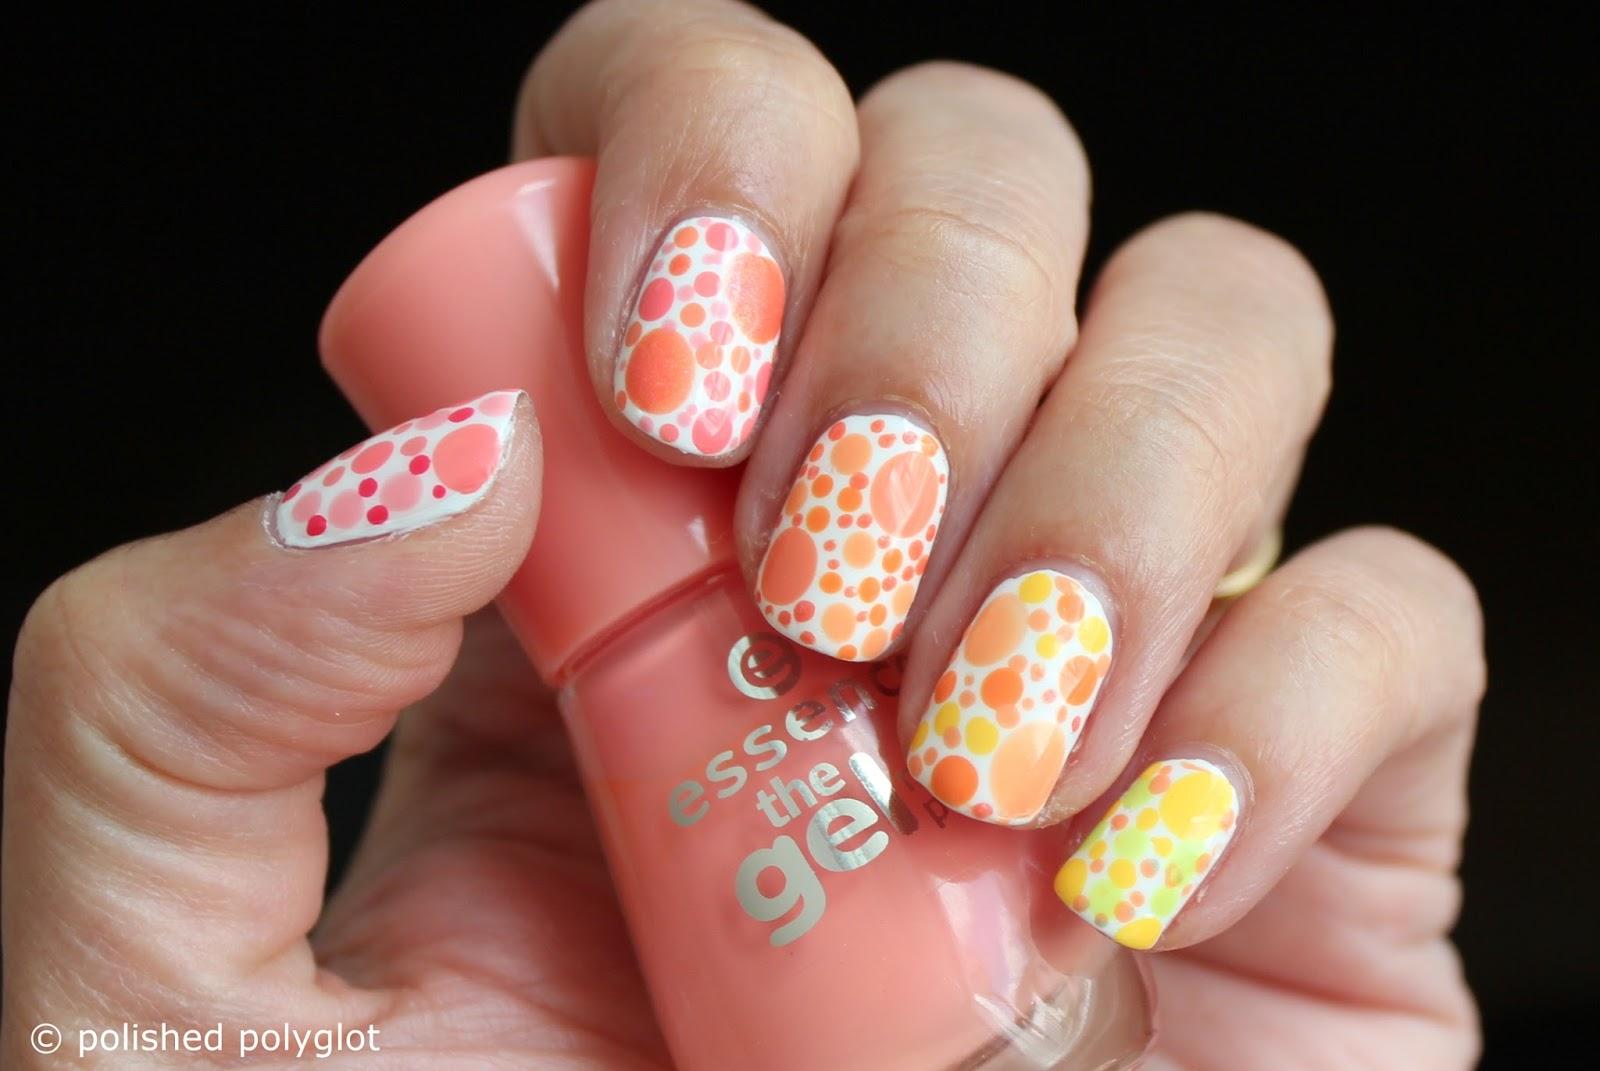 Nail art designs for short nails peach or lemon skittles nail art designs for short nails peach or lemon dotticure prinsesfo Choice Image